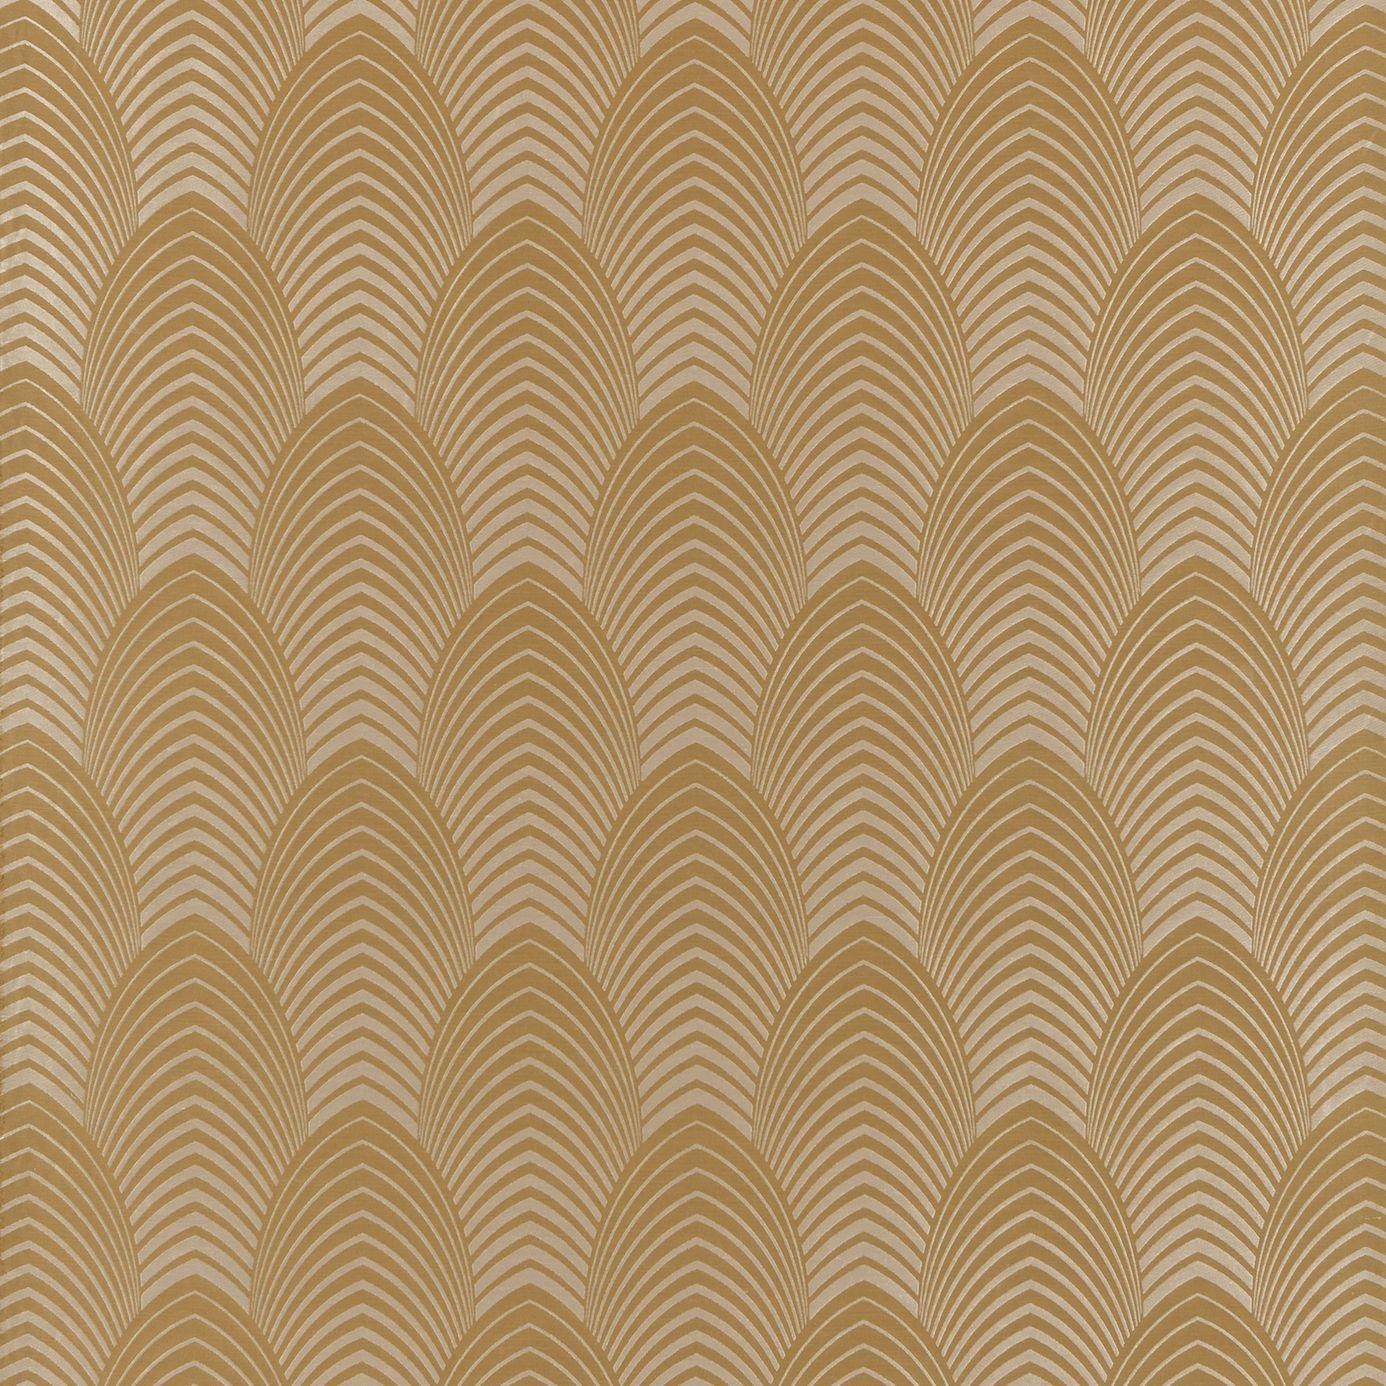 Deco fabric sable latte 8643 harlequin arkona fabrics collection - Deco fabriek ...